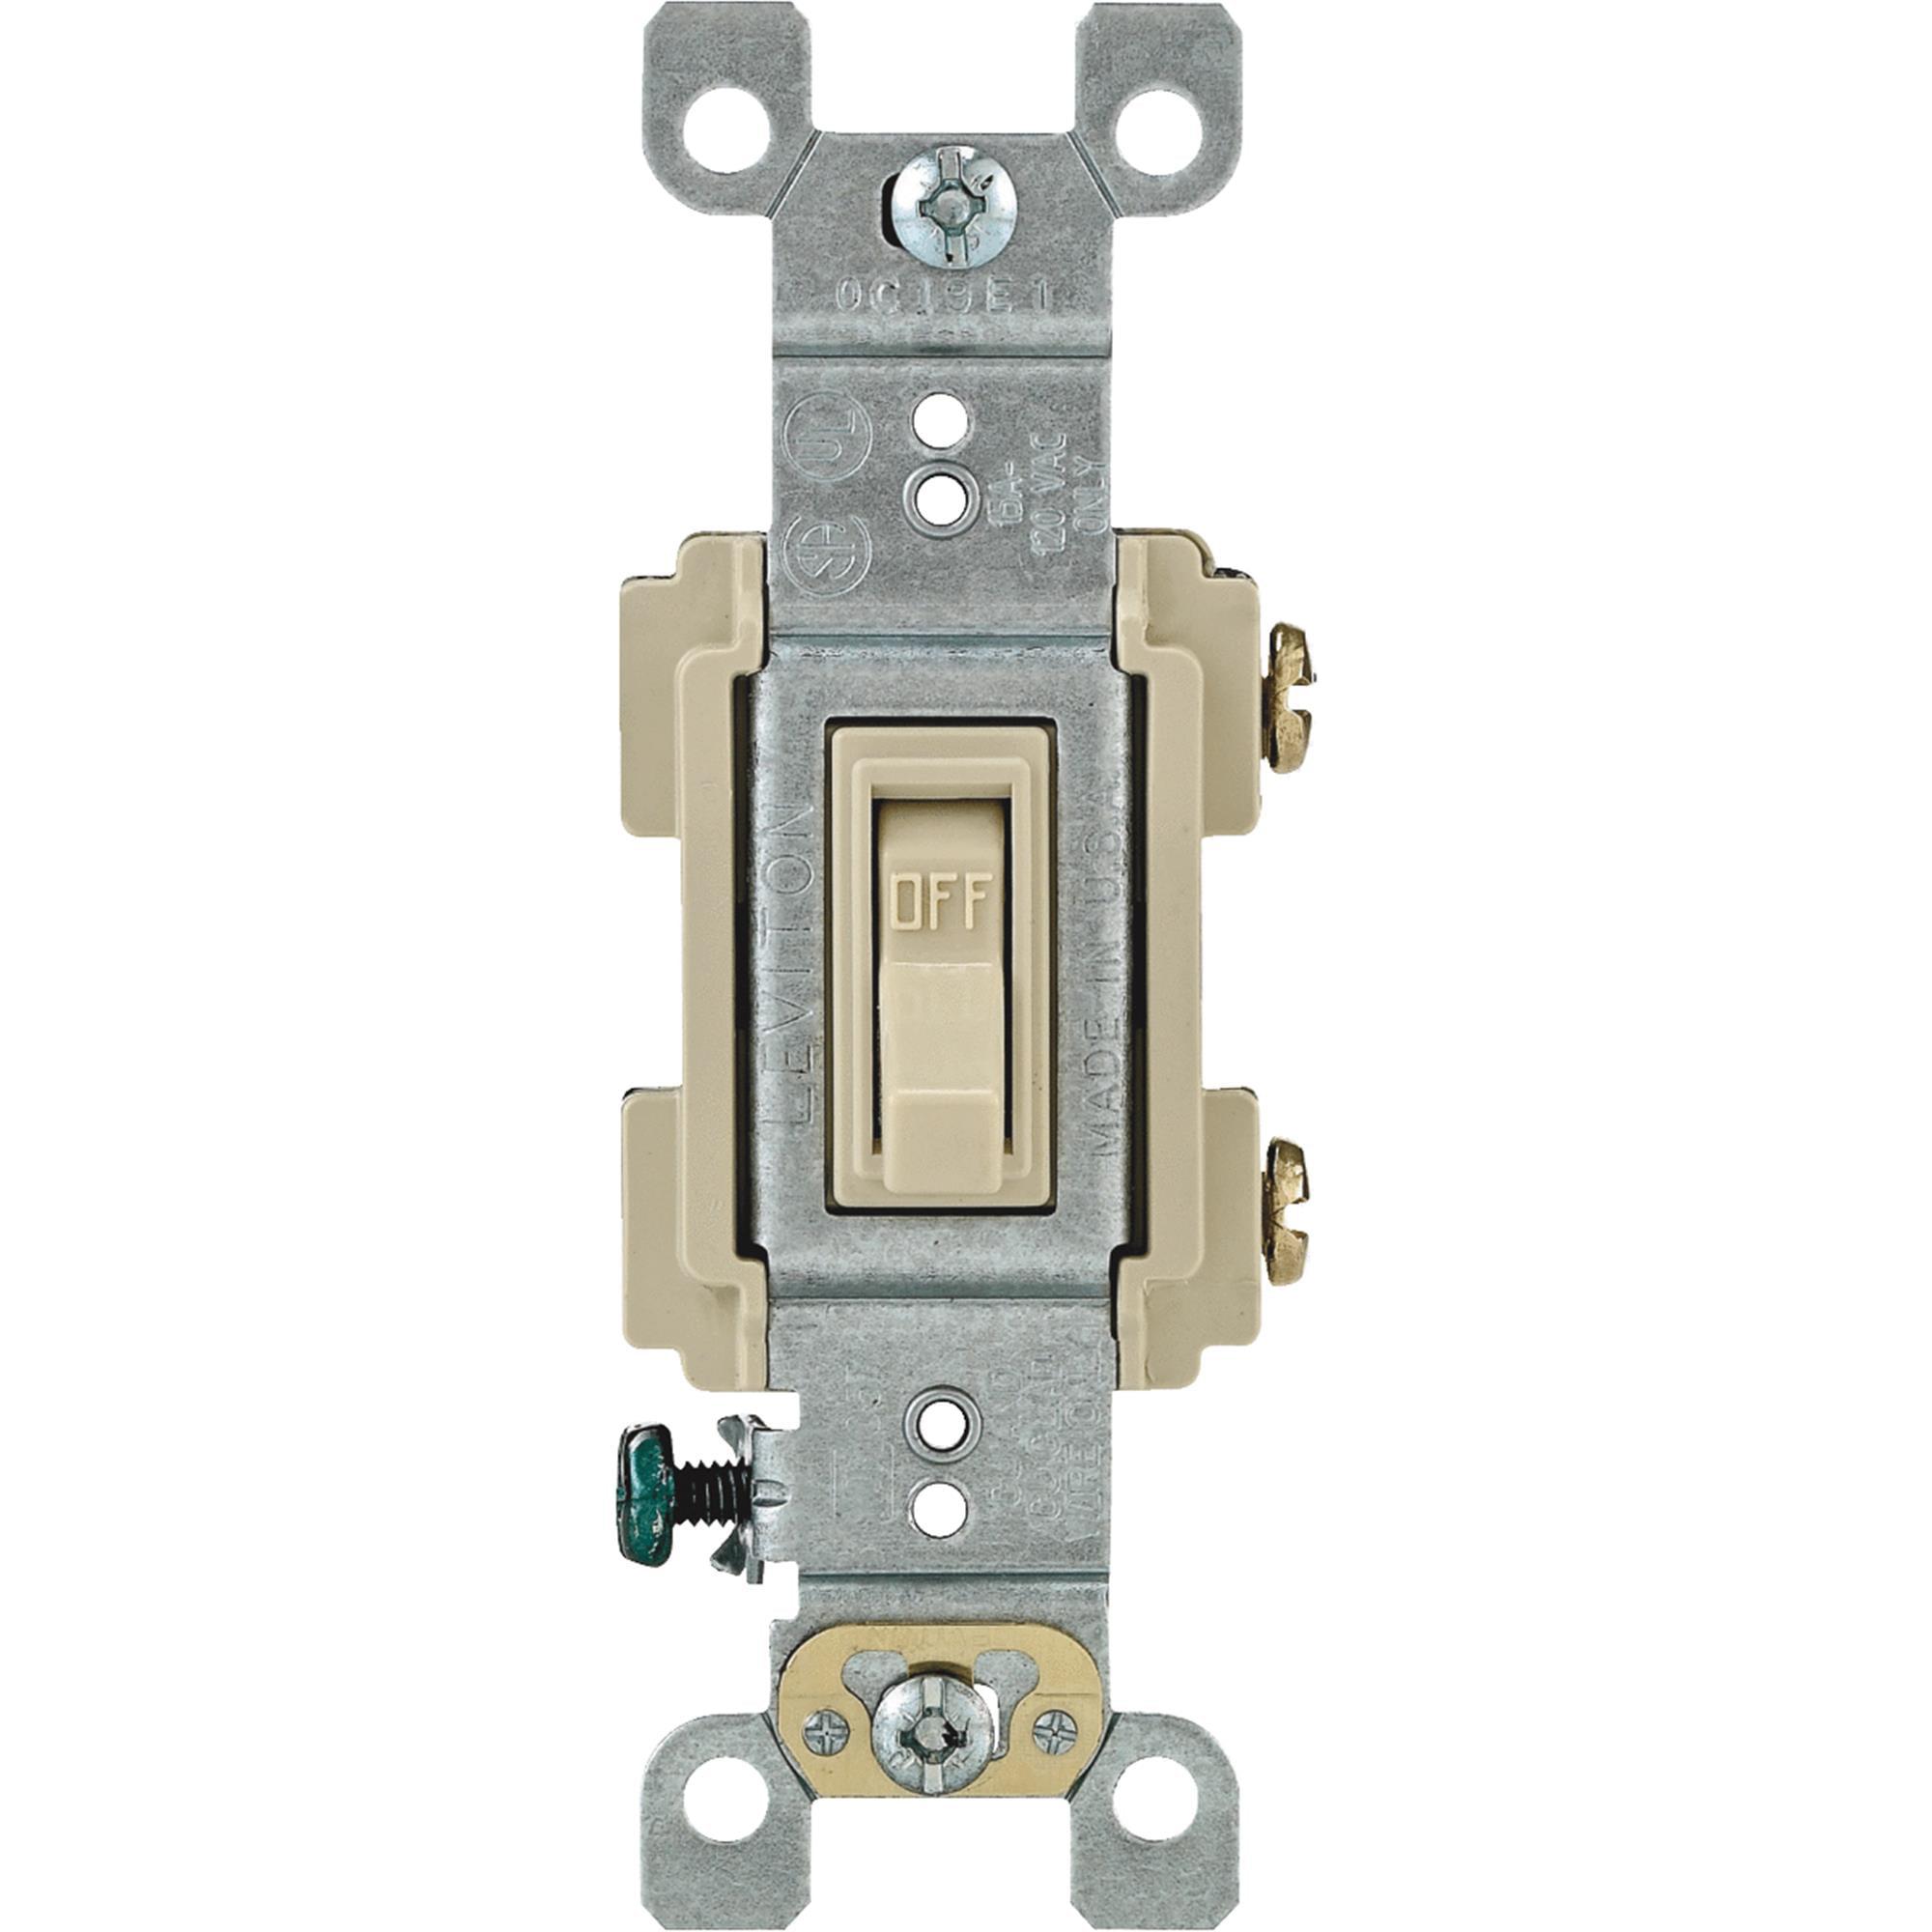 Leviton Residential Grade Toggle Single Pole Switch